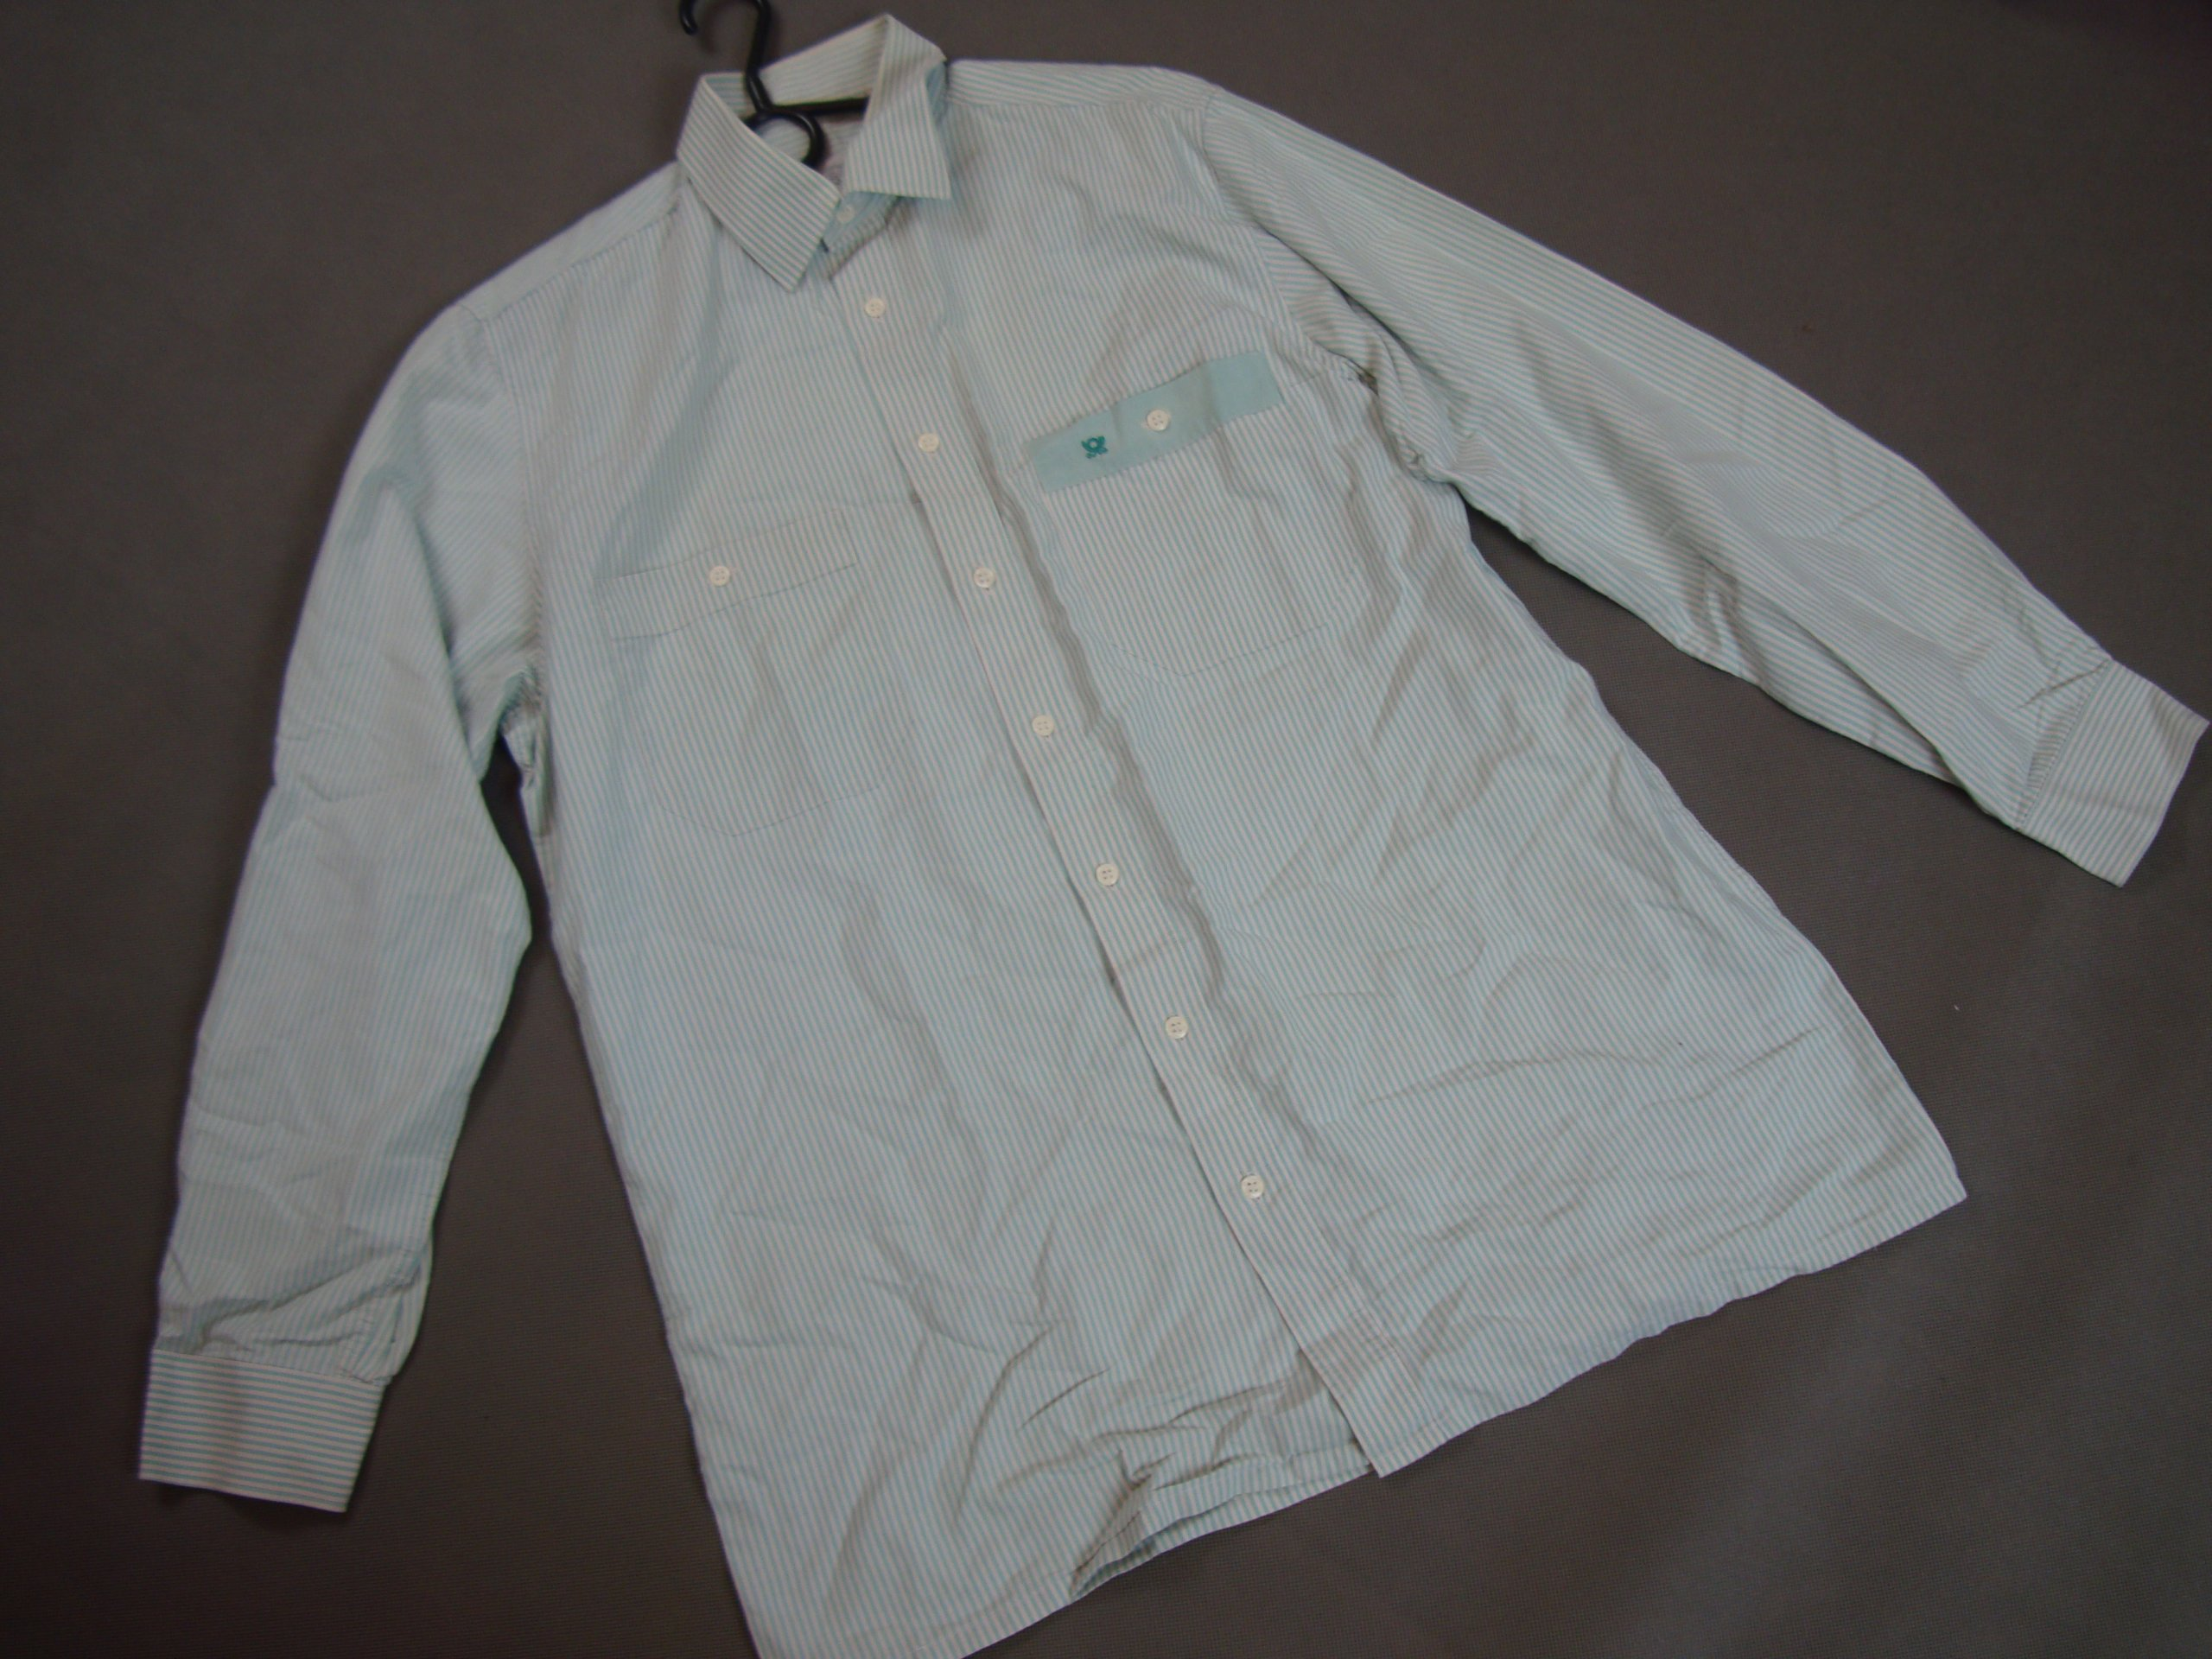 BIAŁO ZIELONA koszula LINCRON SHIRT r.L/XL